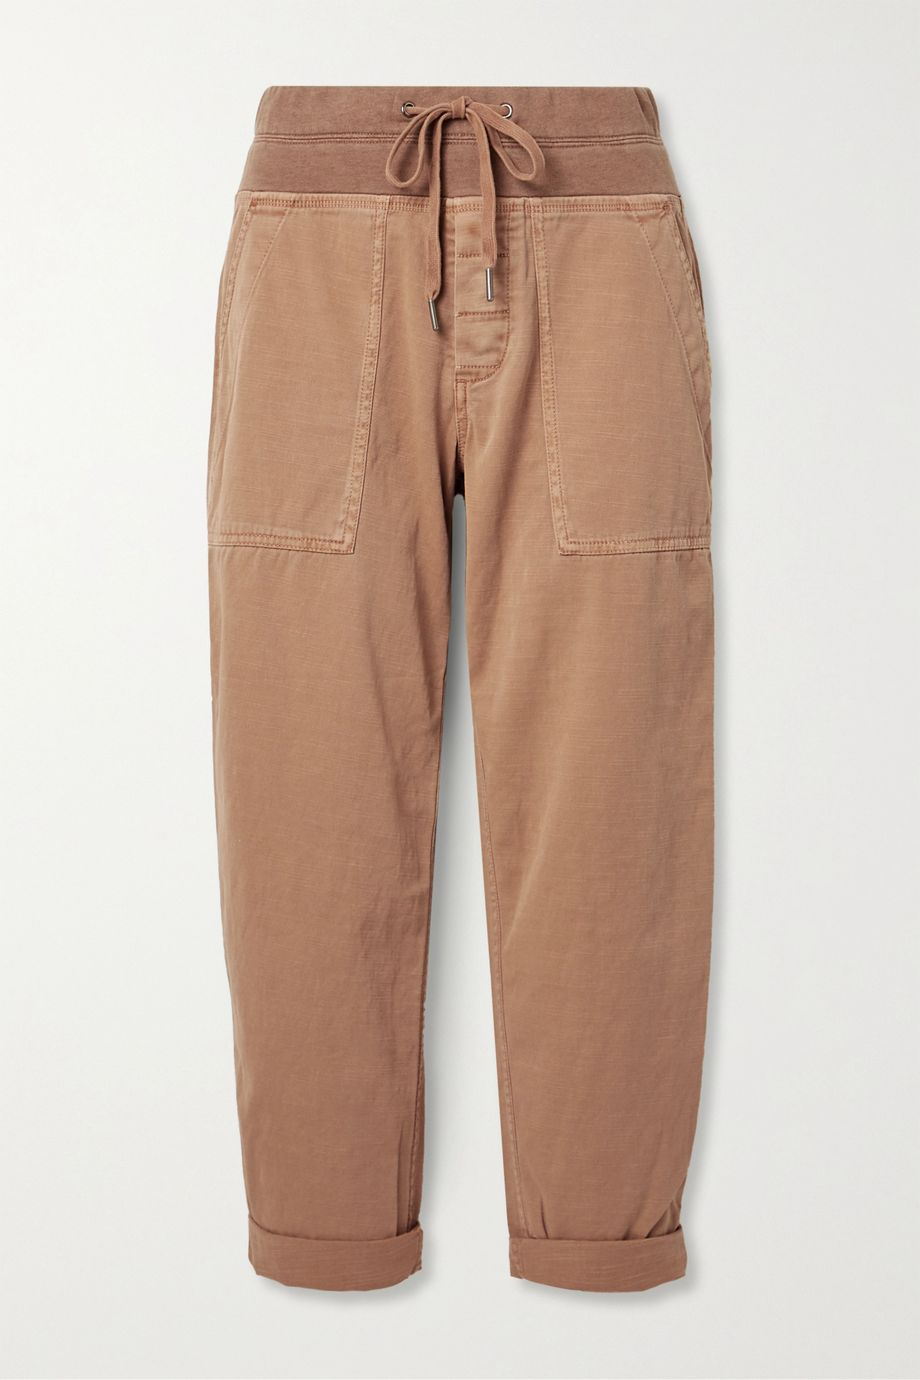 James Perse Pantalon treillis raccourci en serge de coton mélangé